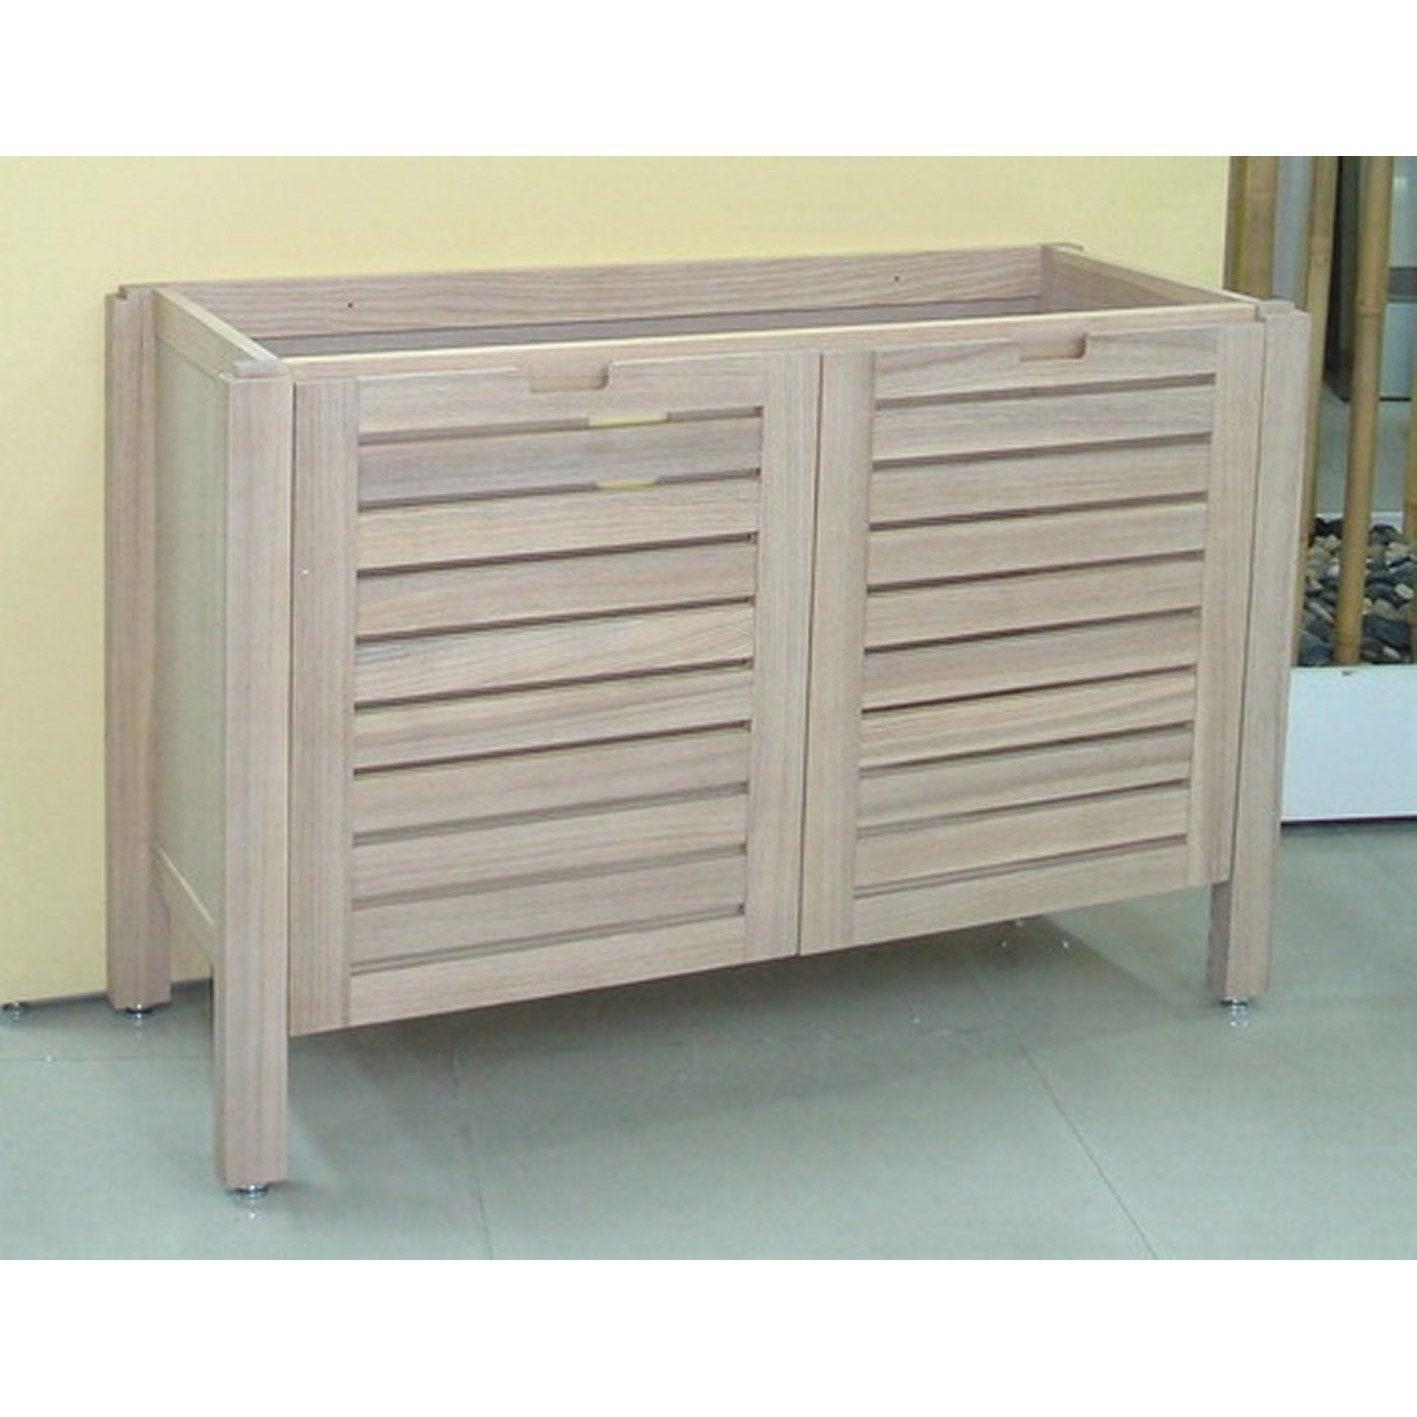 caisson meuble salle de bain perfect caisson meuble salle de bain pour idee de salle de bain. Black Bedroom Furniture Sets. Home Design Ideas